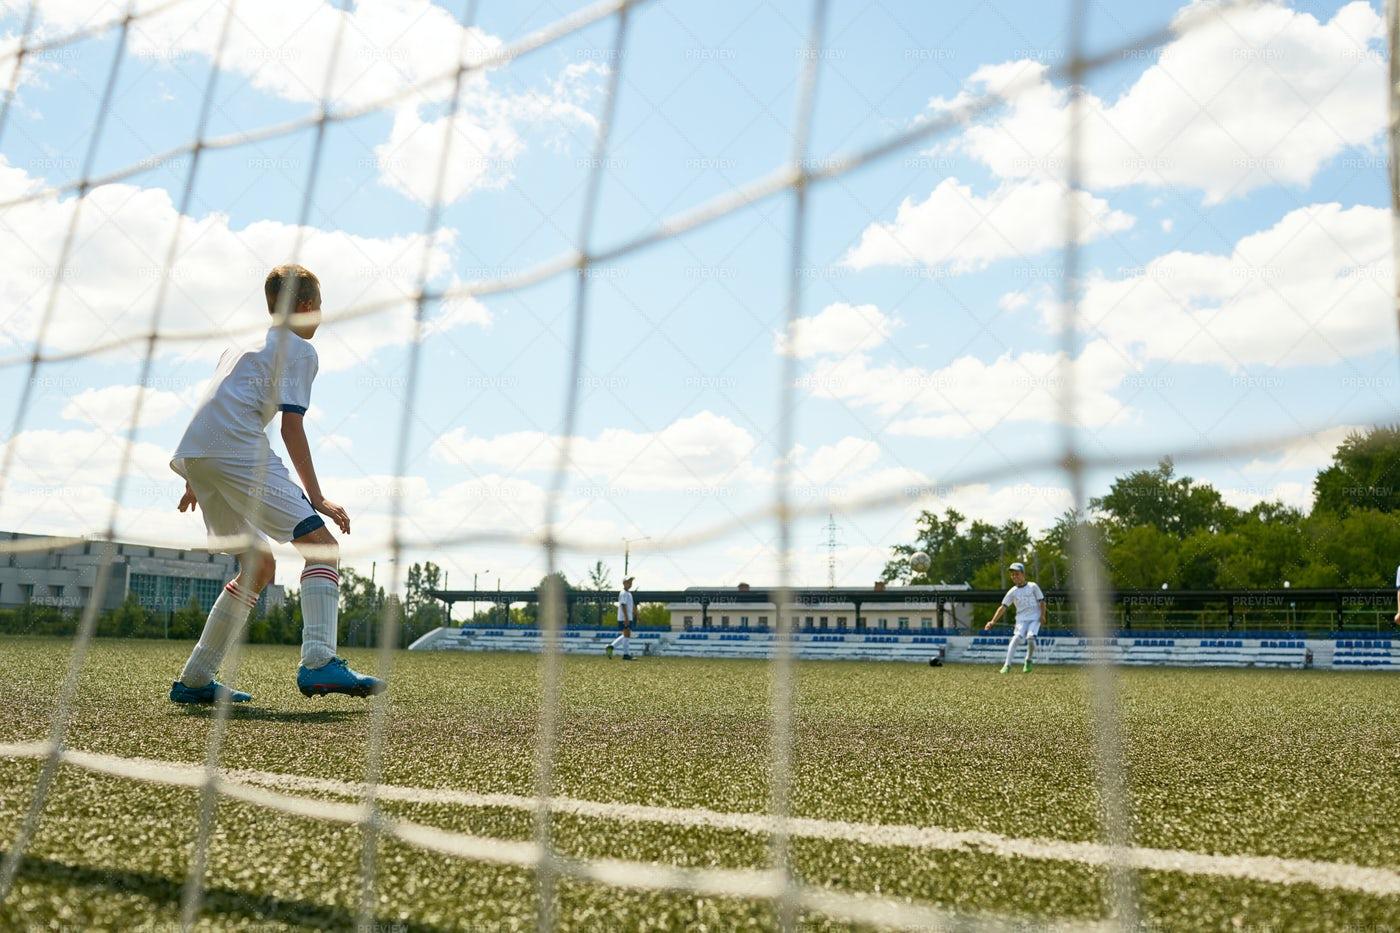 Junior Football Team At Practice: Stock Photos